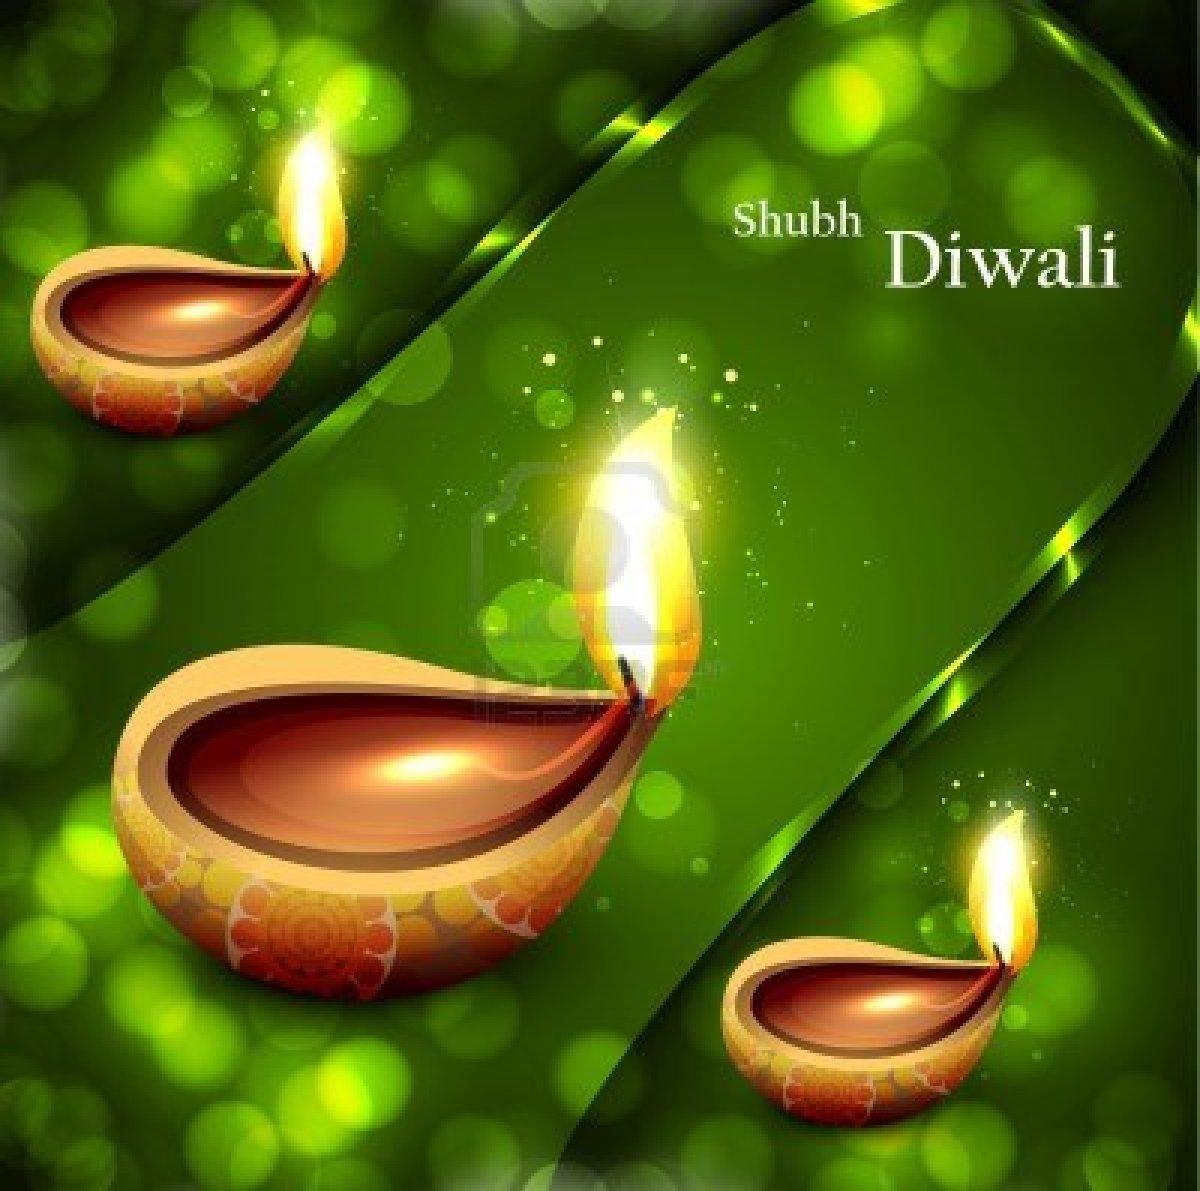 Deepavali 2015 Wallpaper Happy Diwali 2015 Images